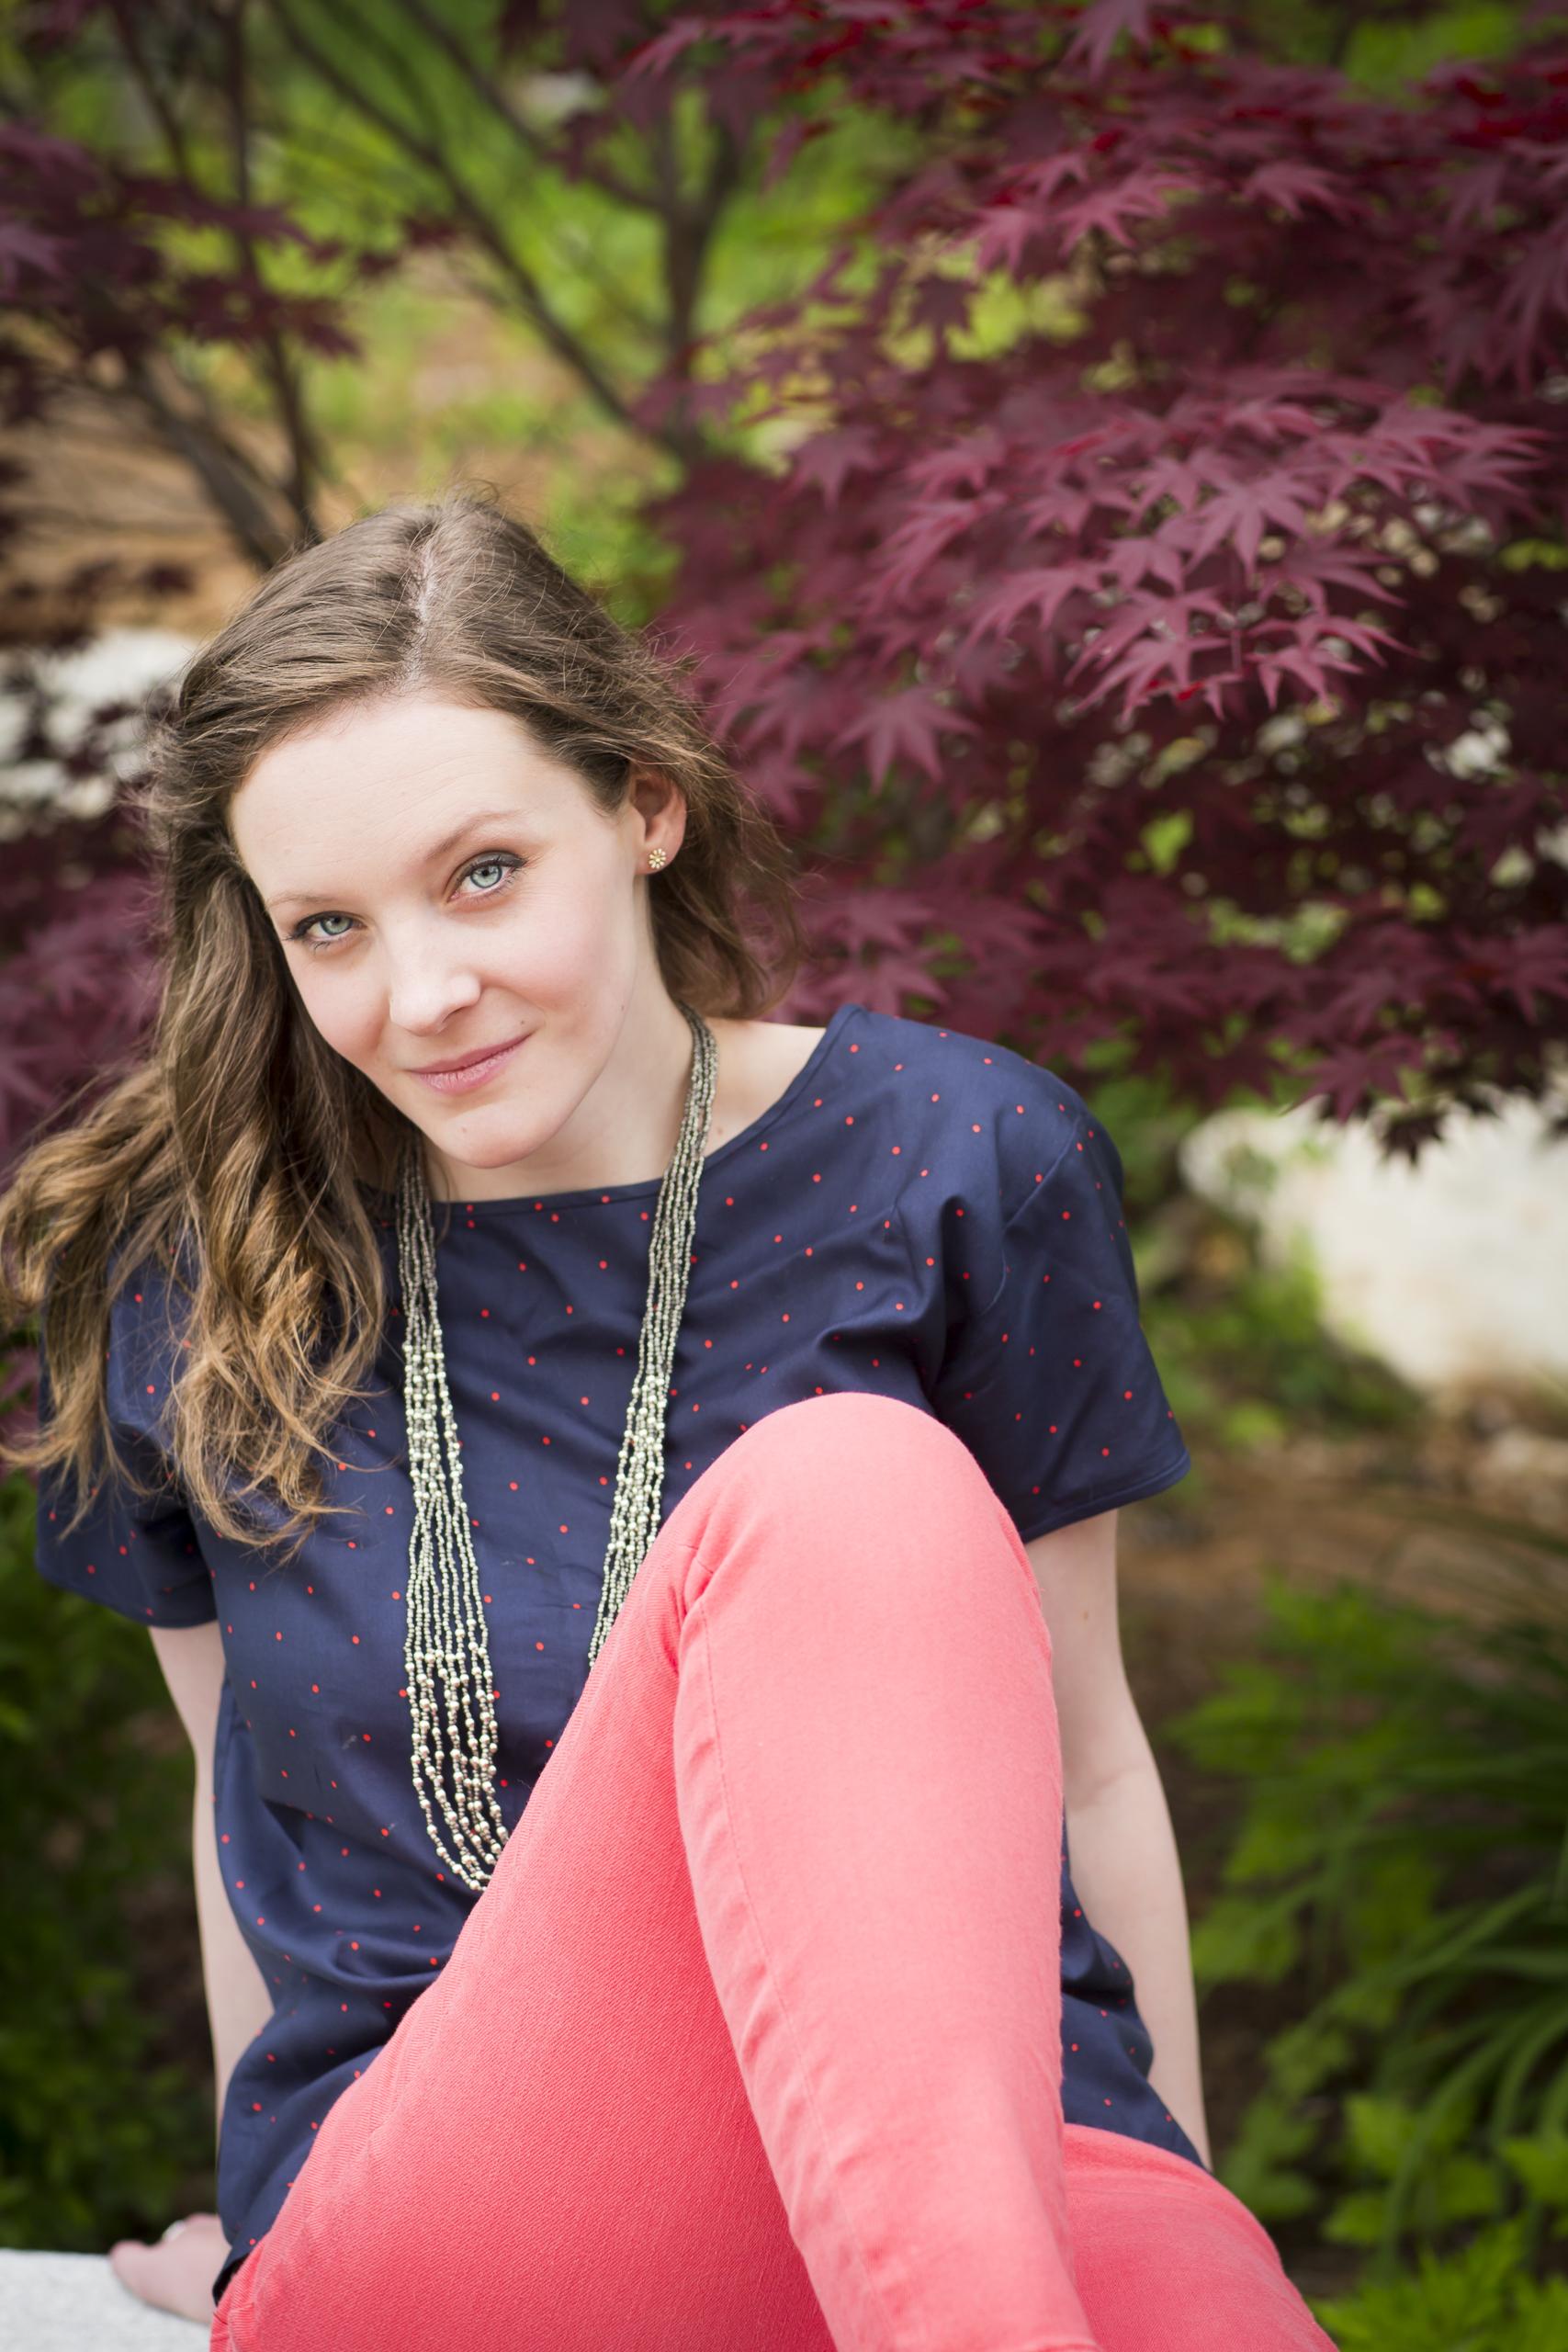 18 modern outdoor styled polka dot shirt senior portrait session with maple tree 4365.jpg